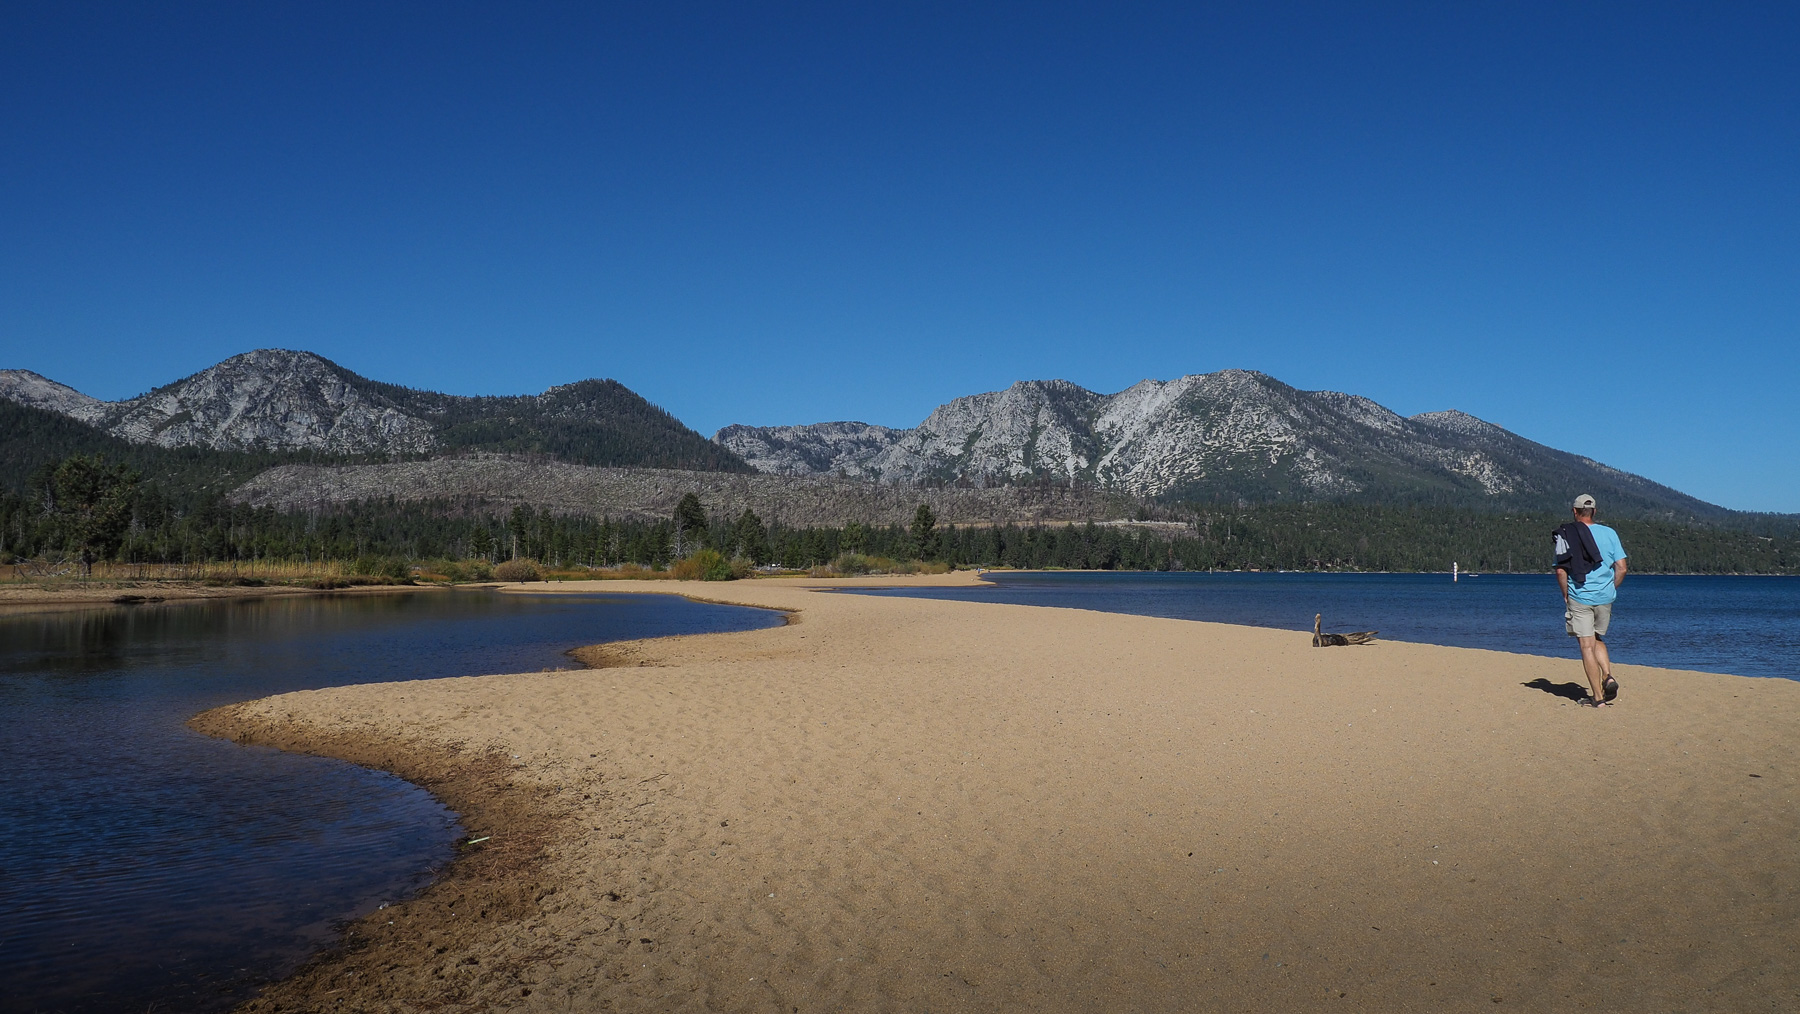 Kleine Wanderung am Lake Tahoe